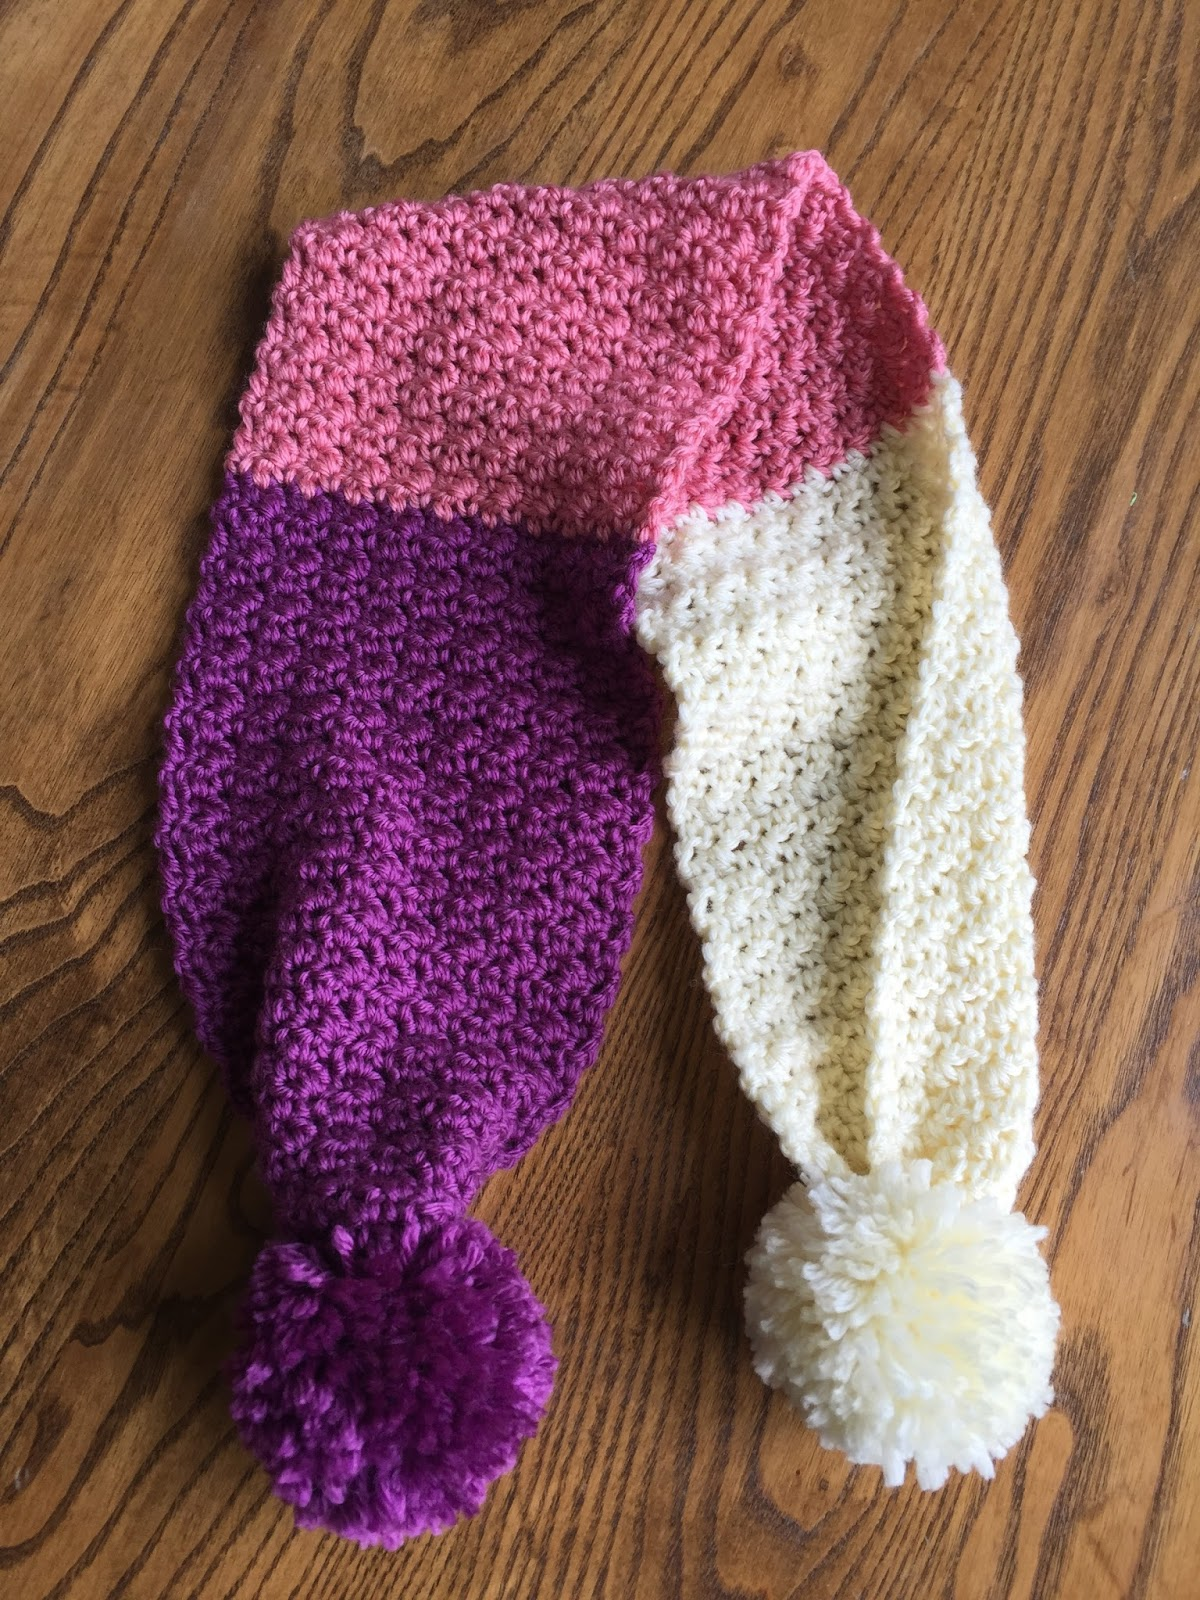 Skein And Hook Free Crochet Pattern The Greene Pom Pom Scarf